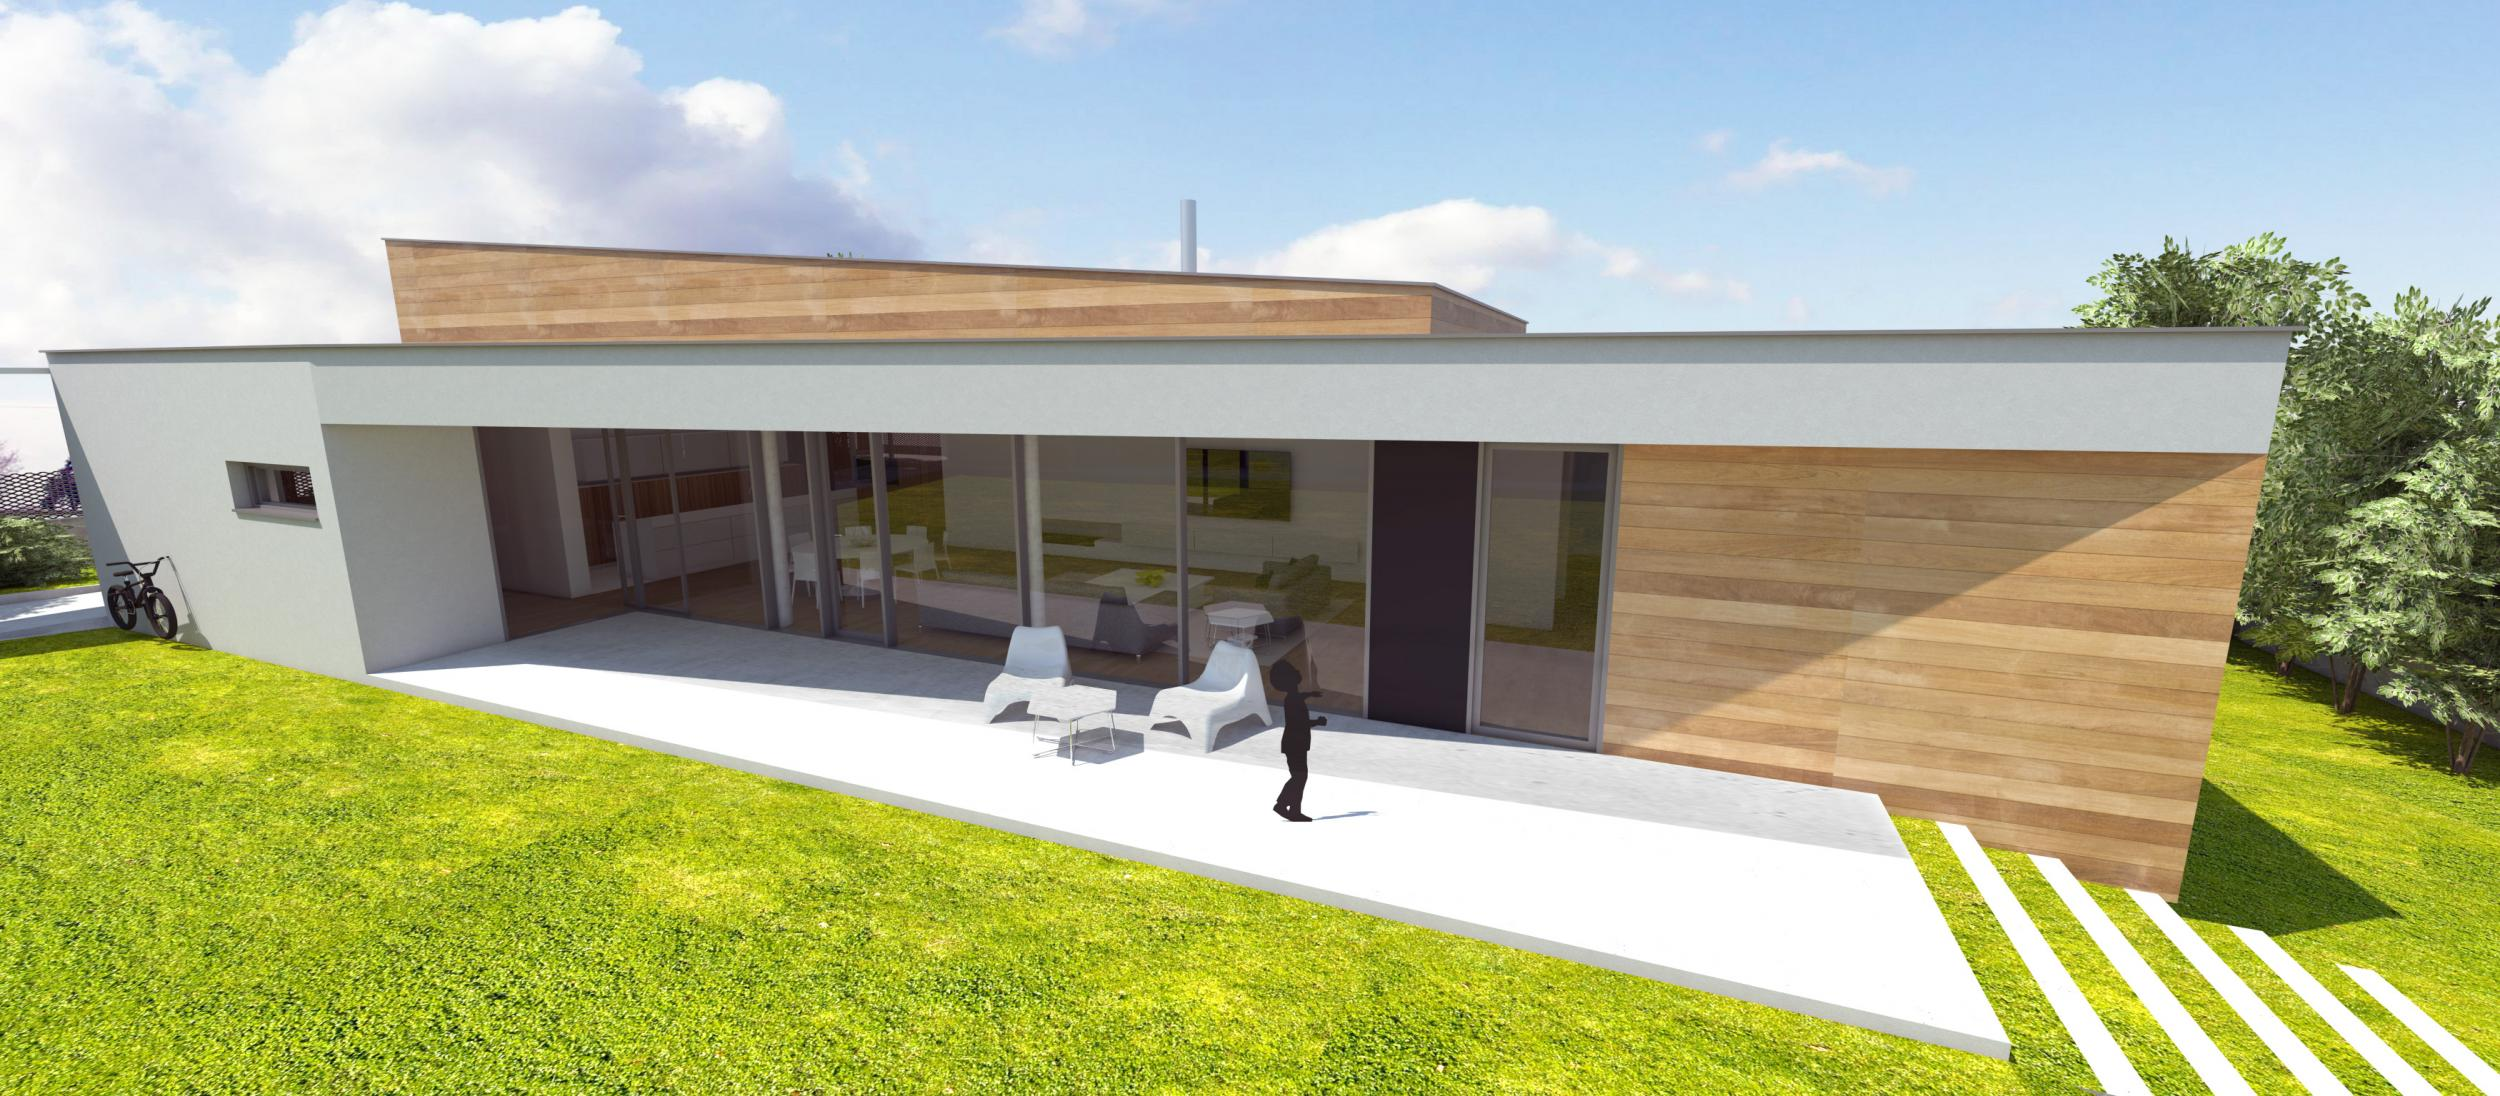 best bungalow mit atrium gallery. Black Bedroom Furniture Sets. Home Design Ideas